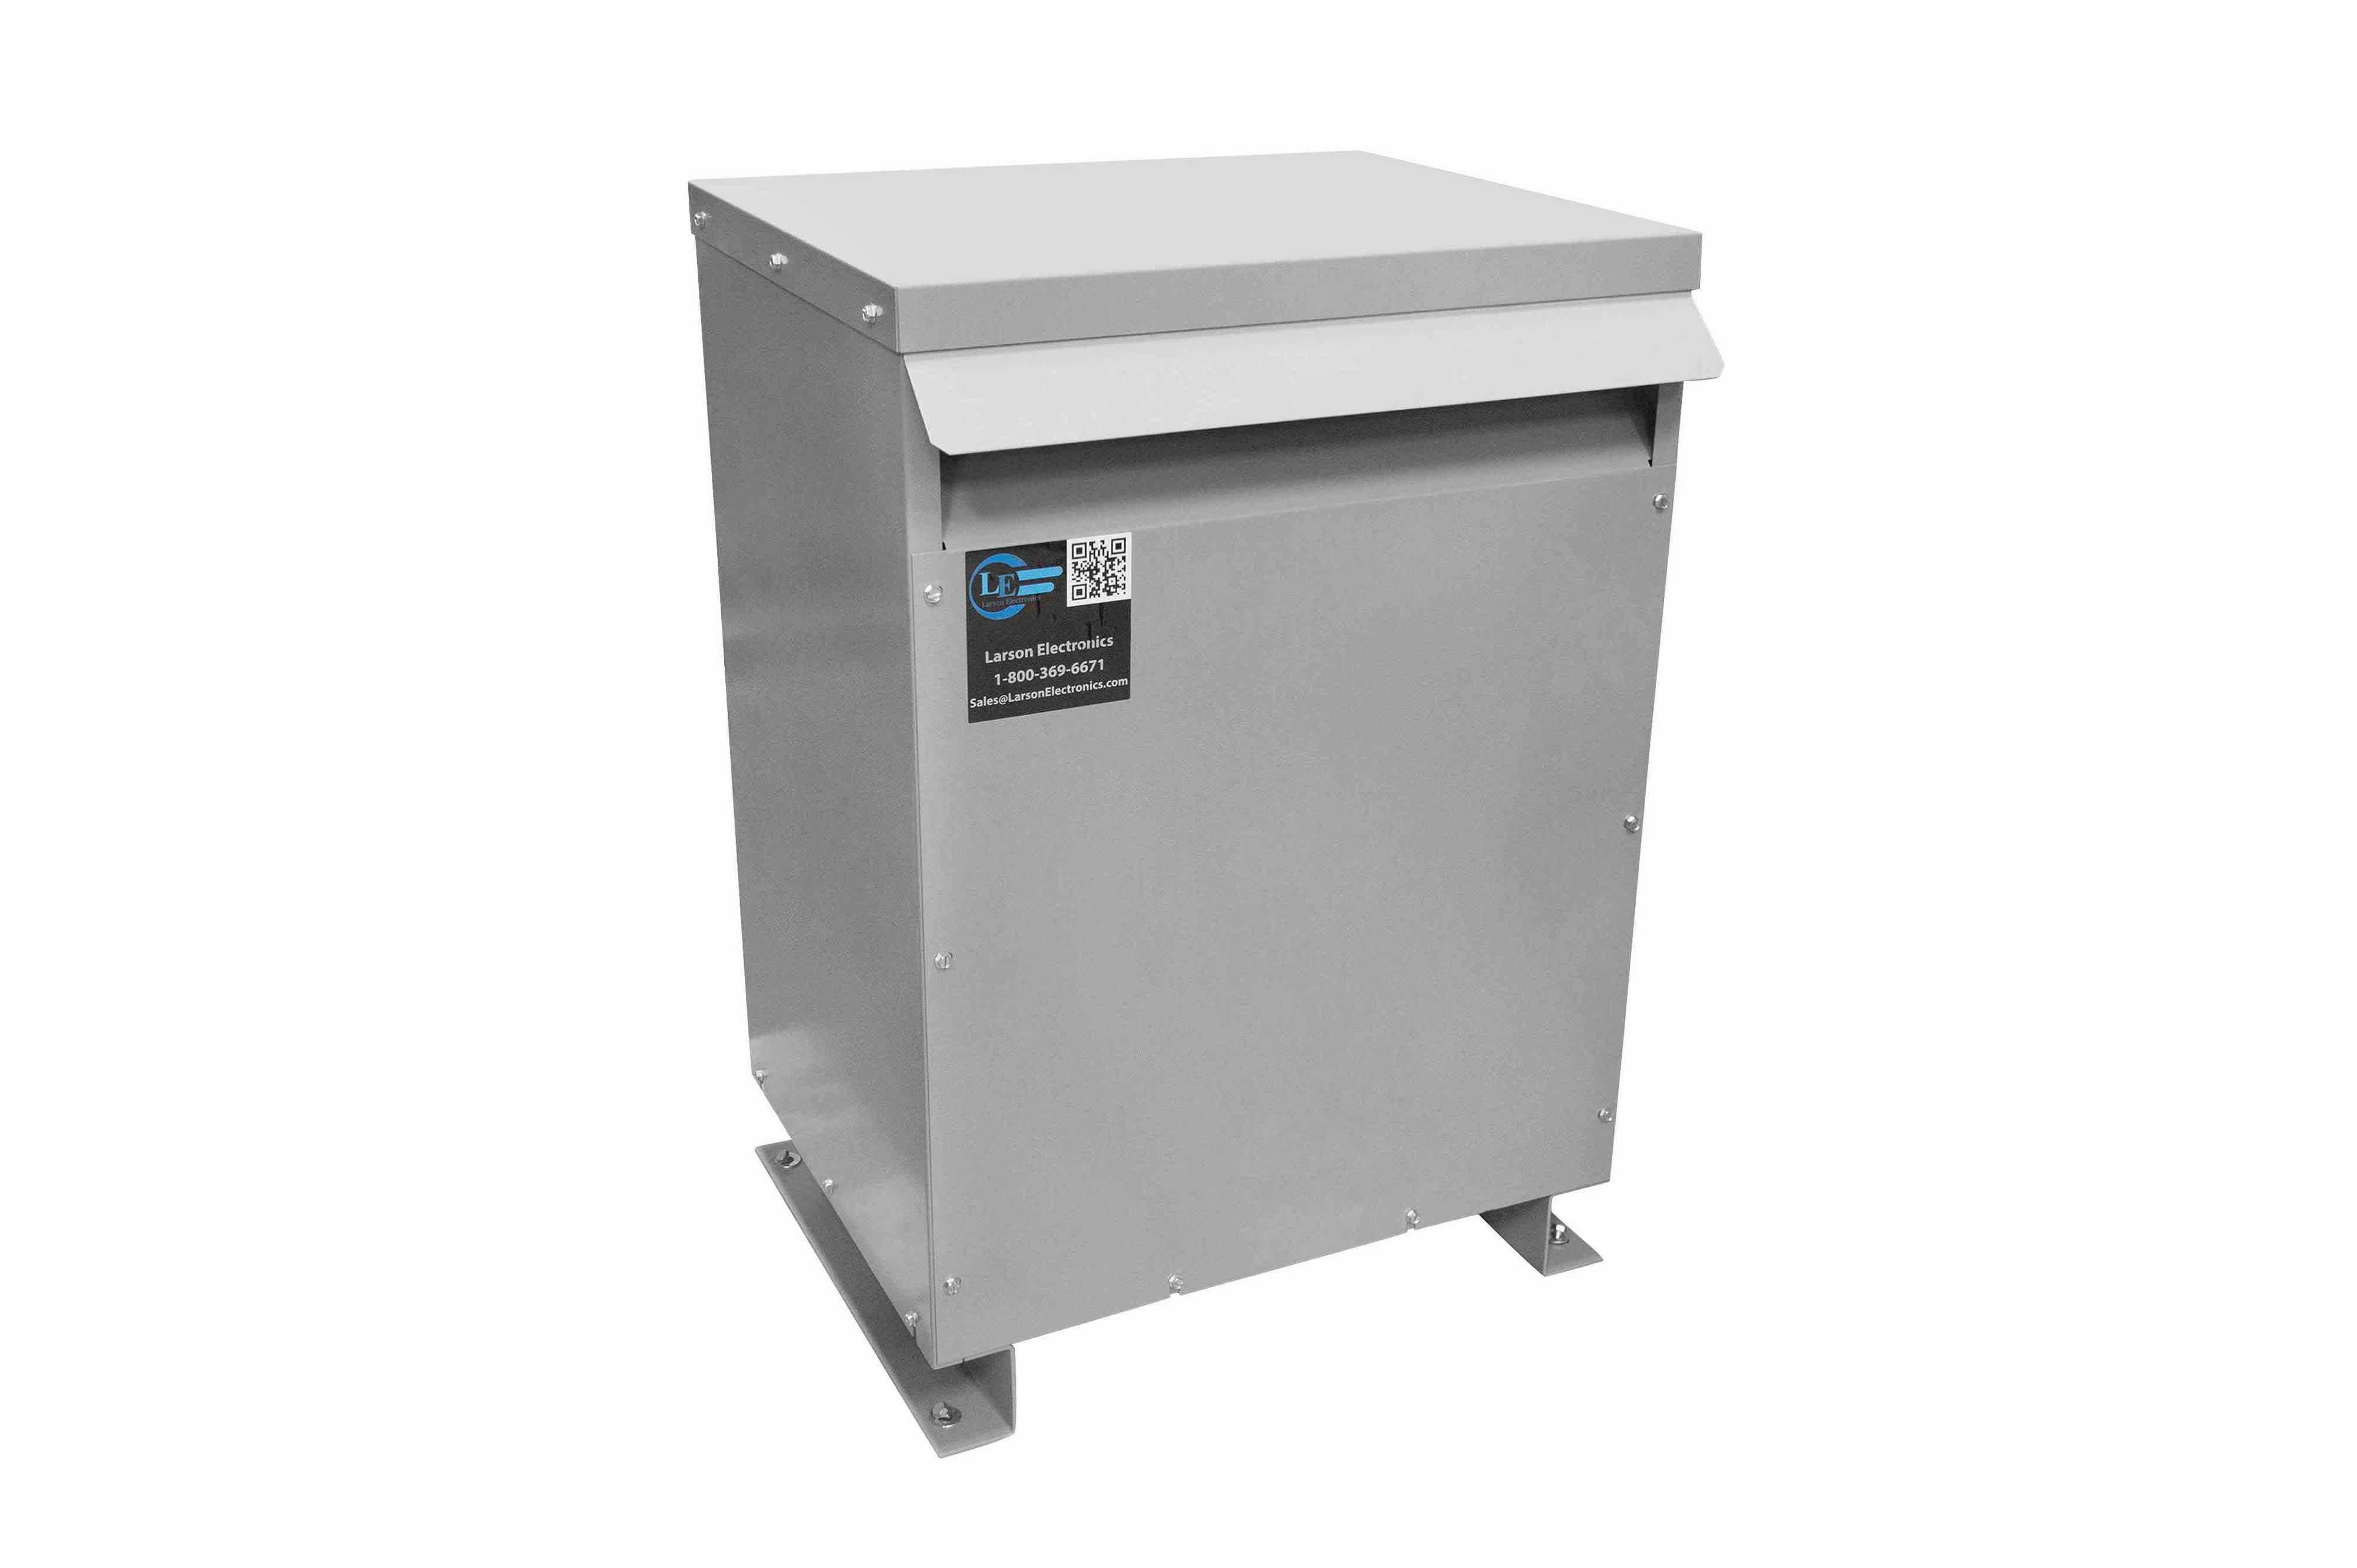 55 kVA 3PH Isolation Transformer, 208V Wye Primary, 415V Delta Secondary, N3R, Ventilated, 60 Hz